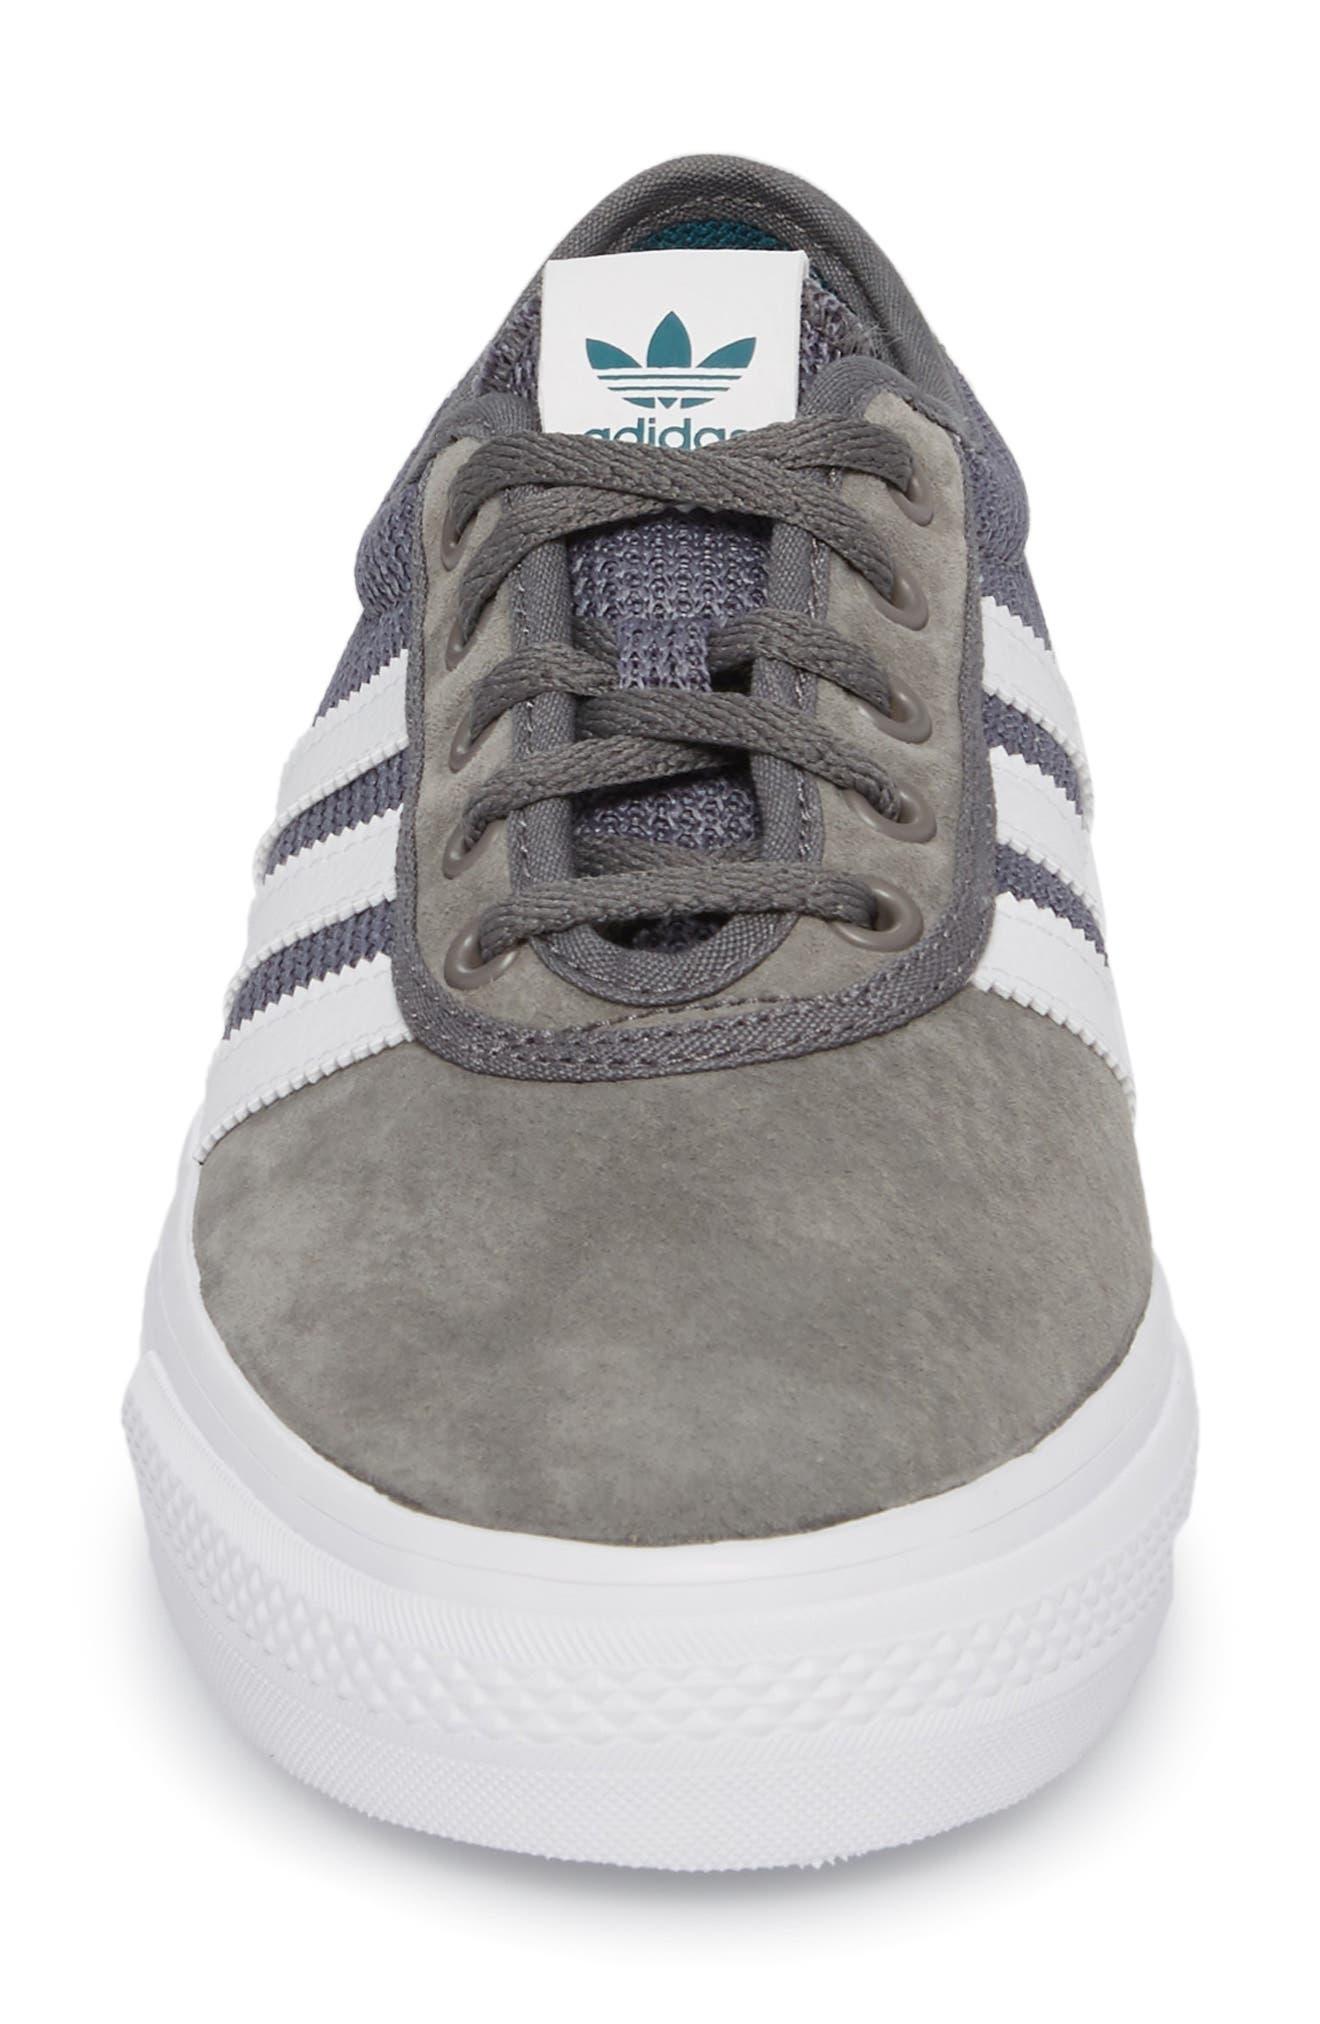 adi-Ease Sneaker,                             Alternate thumbnail 4, color,                             023